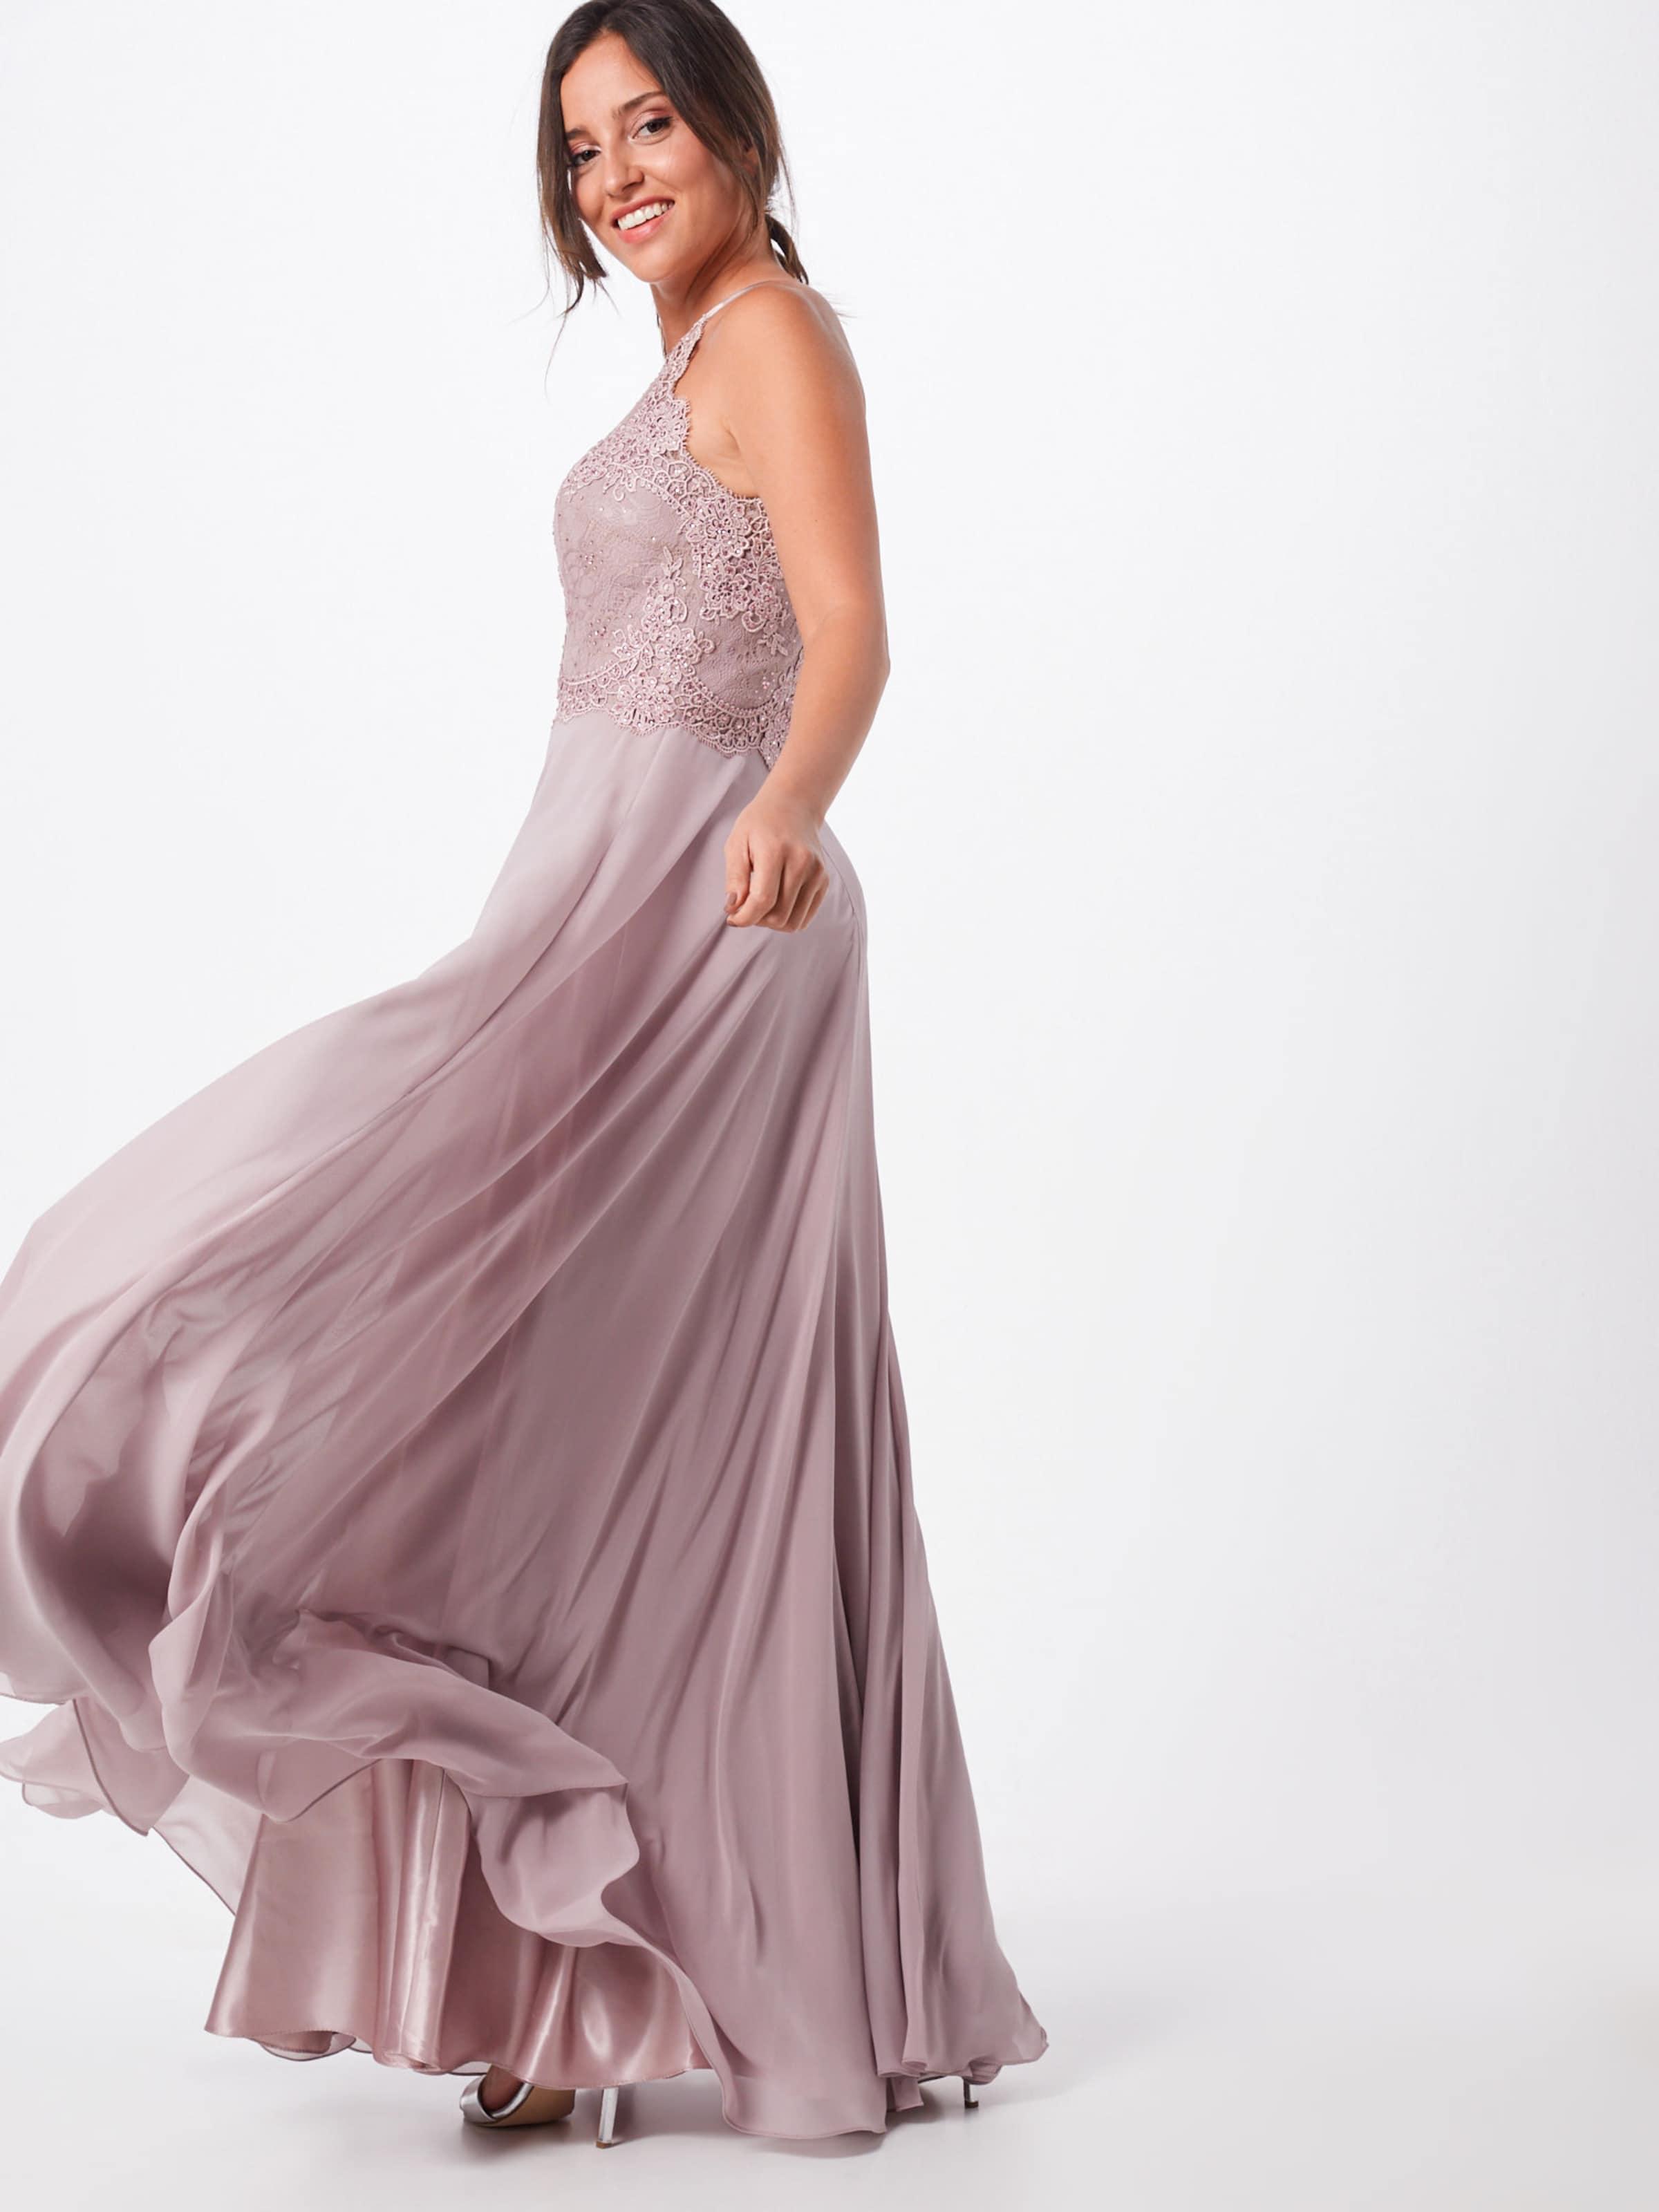 En Lilas Luxuar Robe Soirée De 54qjc3ARLS